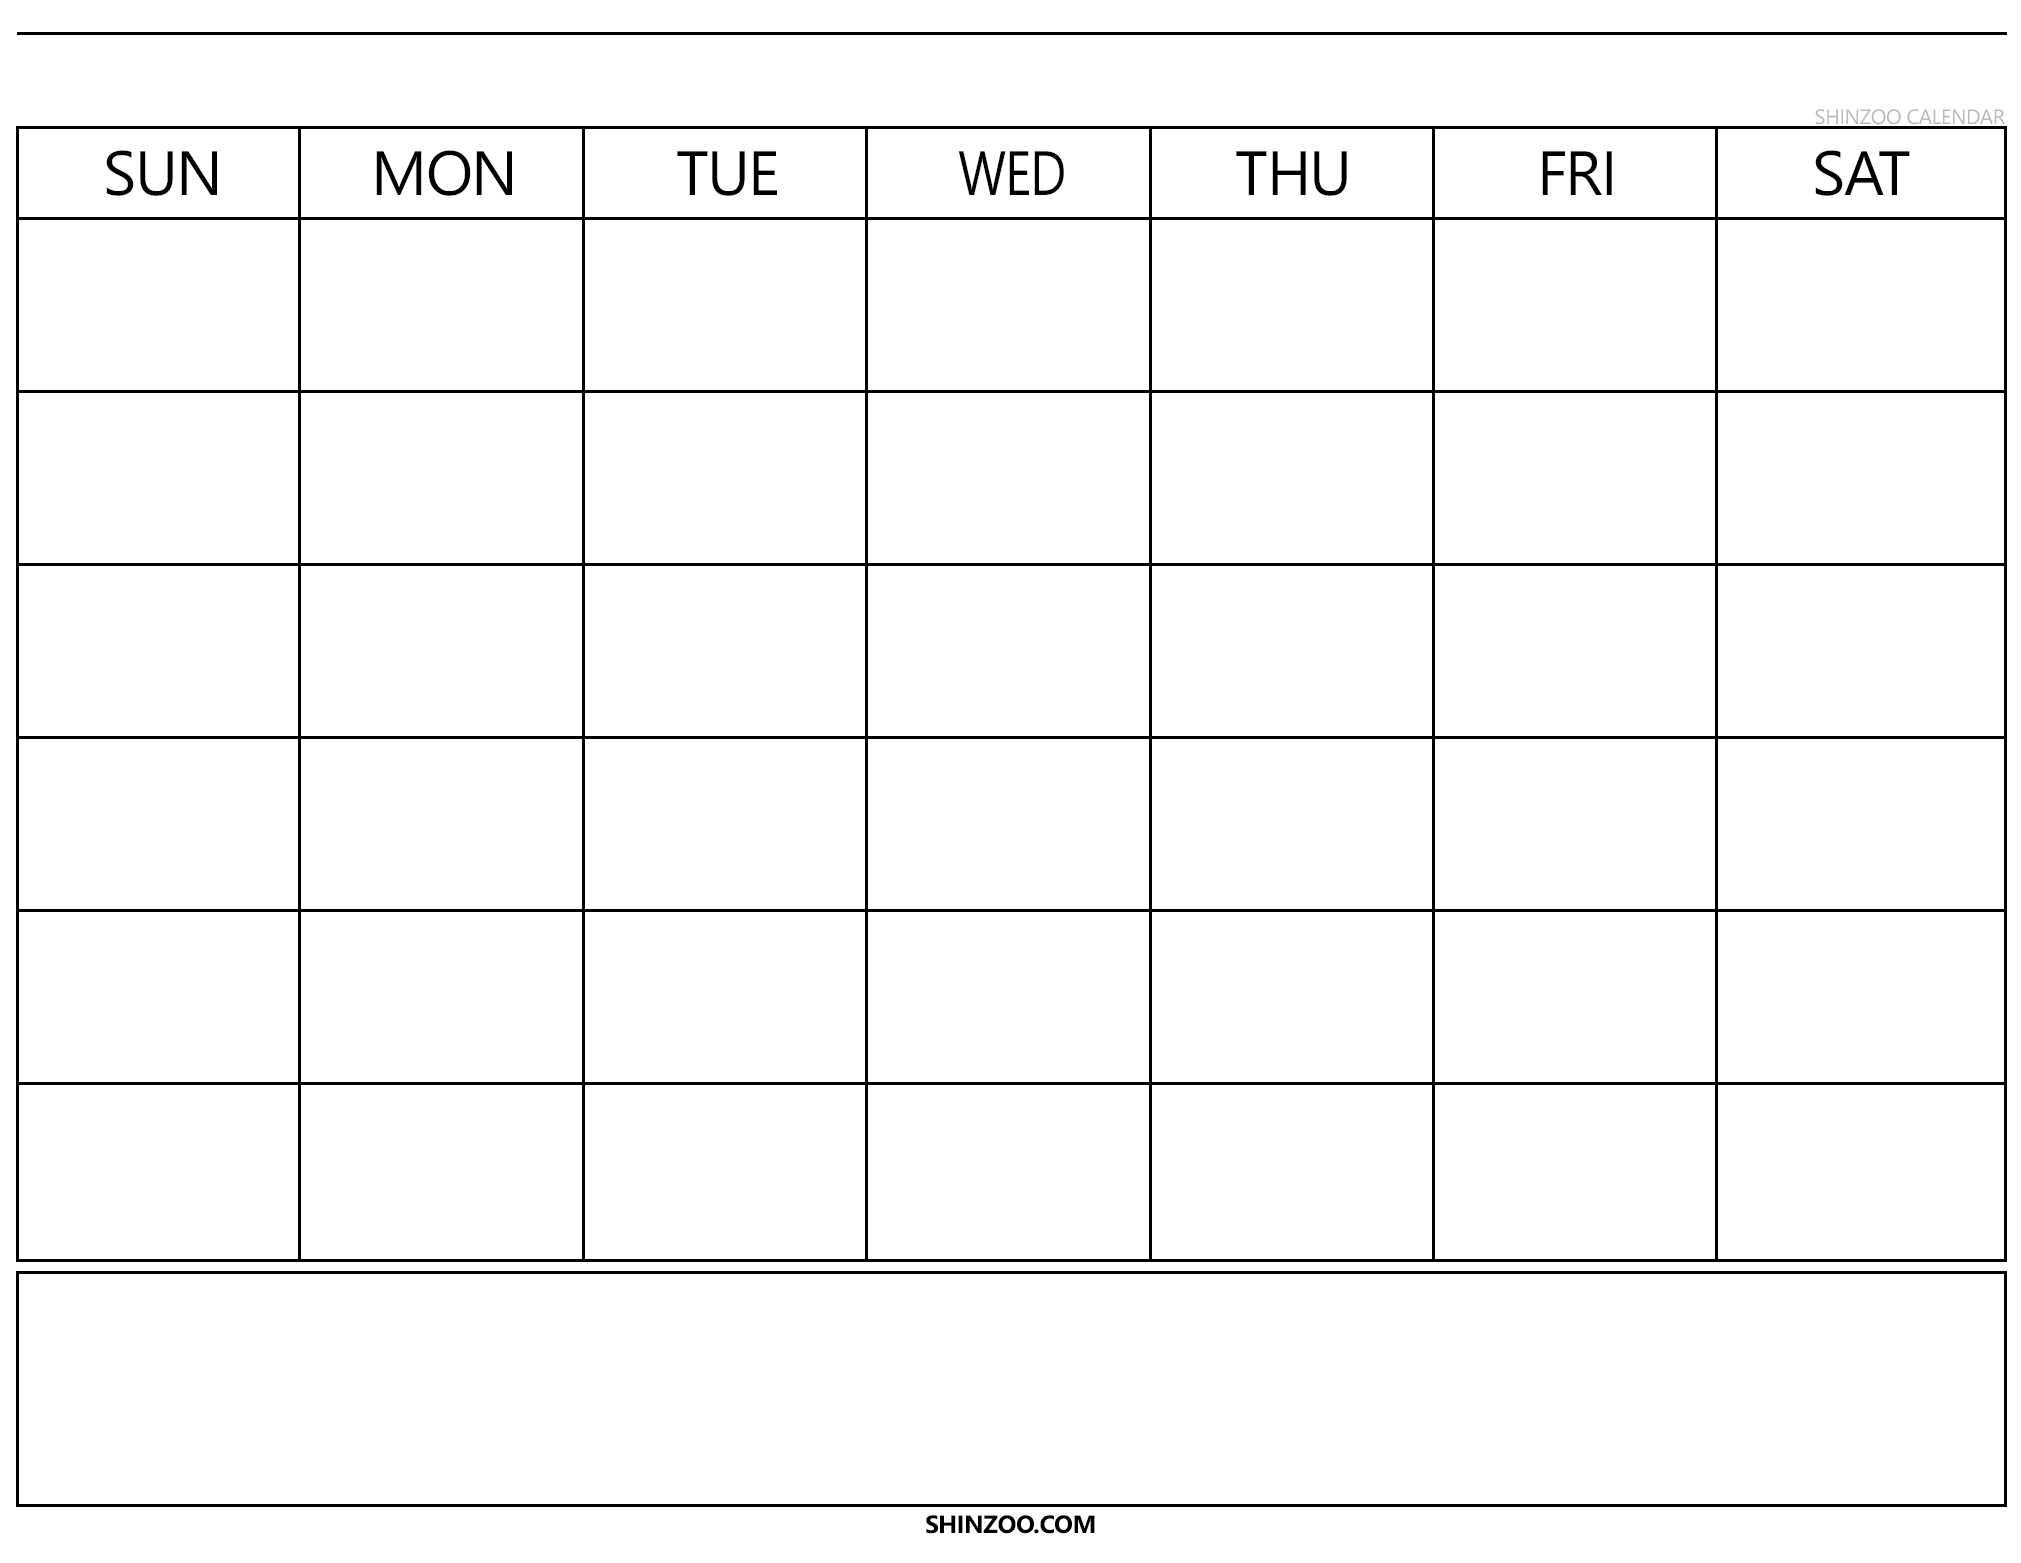 Blank Calendar Template 2019 2020 Printable inside Blank Calender Template